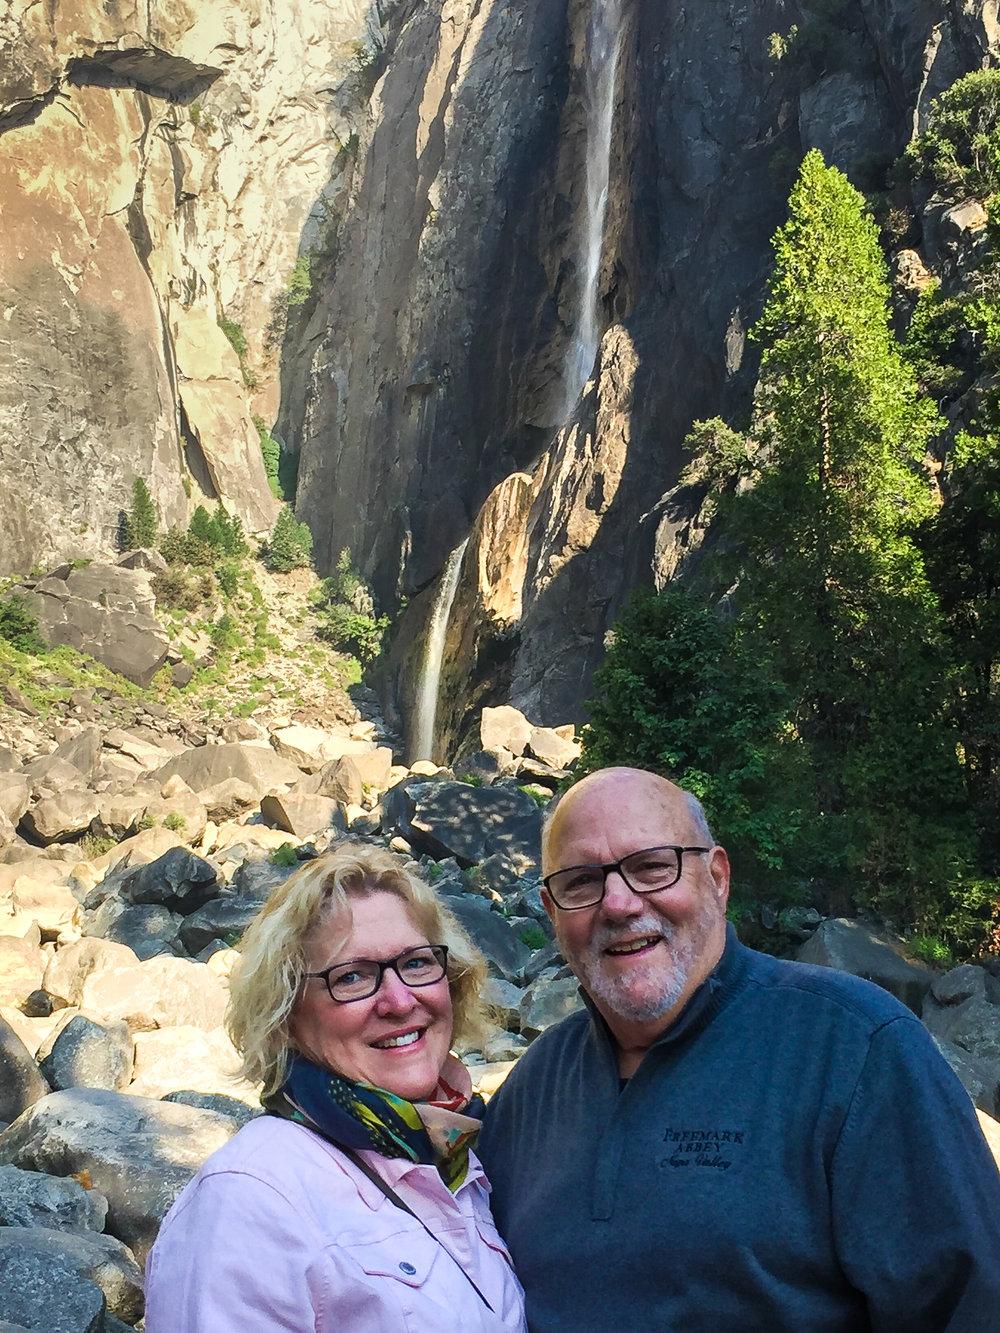 NAPA-Yosemite-37.jpg